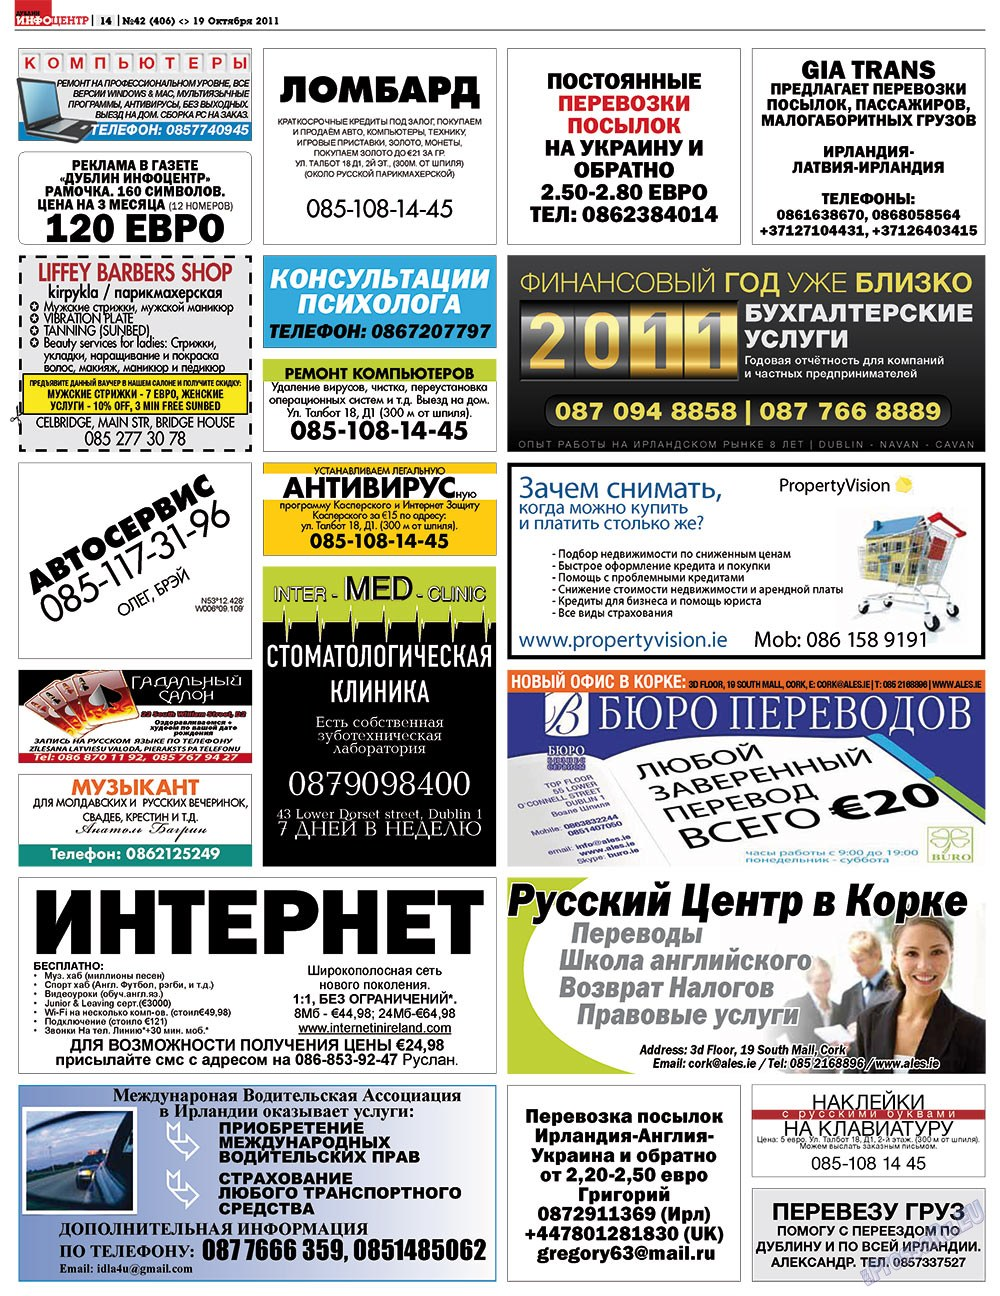 Дублин инфоцентр (газета). 2011 год, номер 42, стр. 14